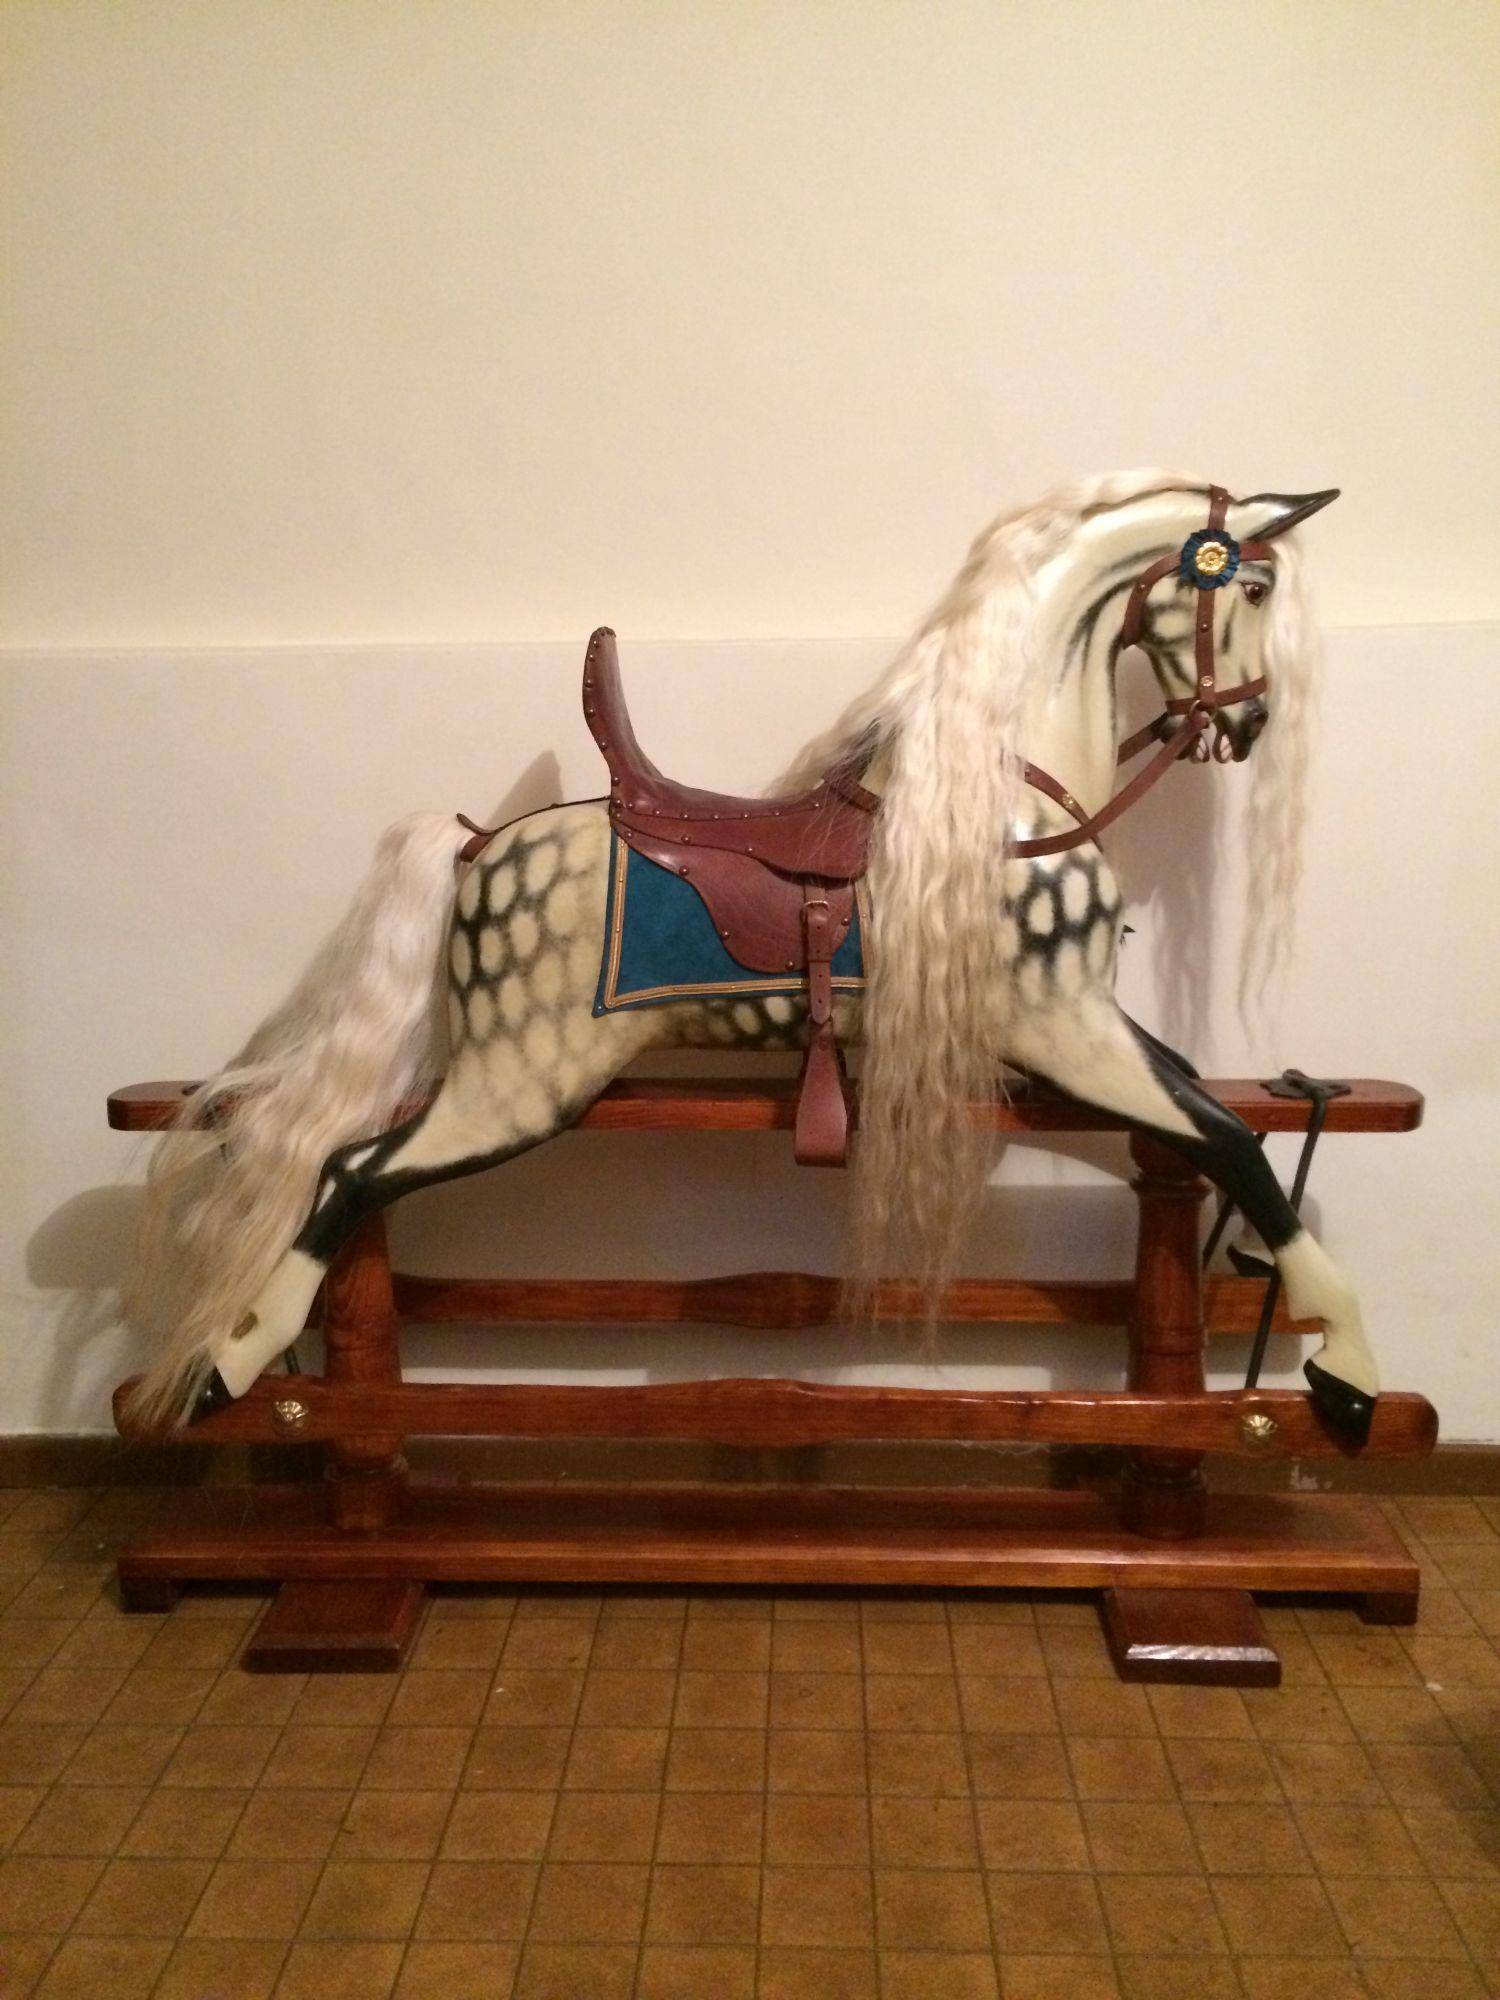 Sold - Stunning rare antique Gamages Bronco rocking horse